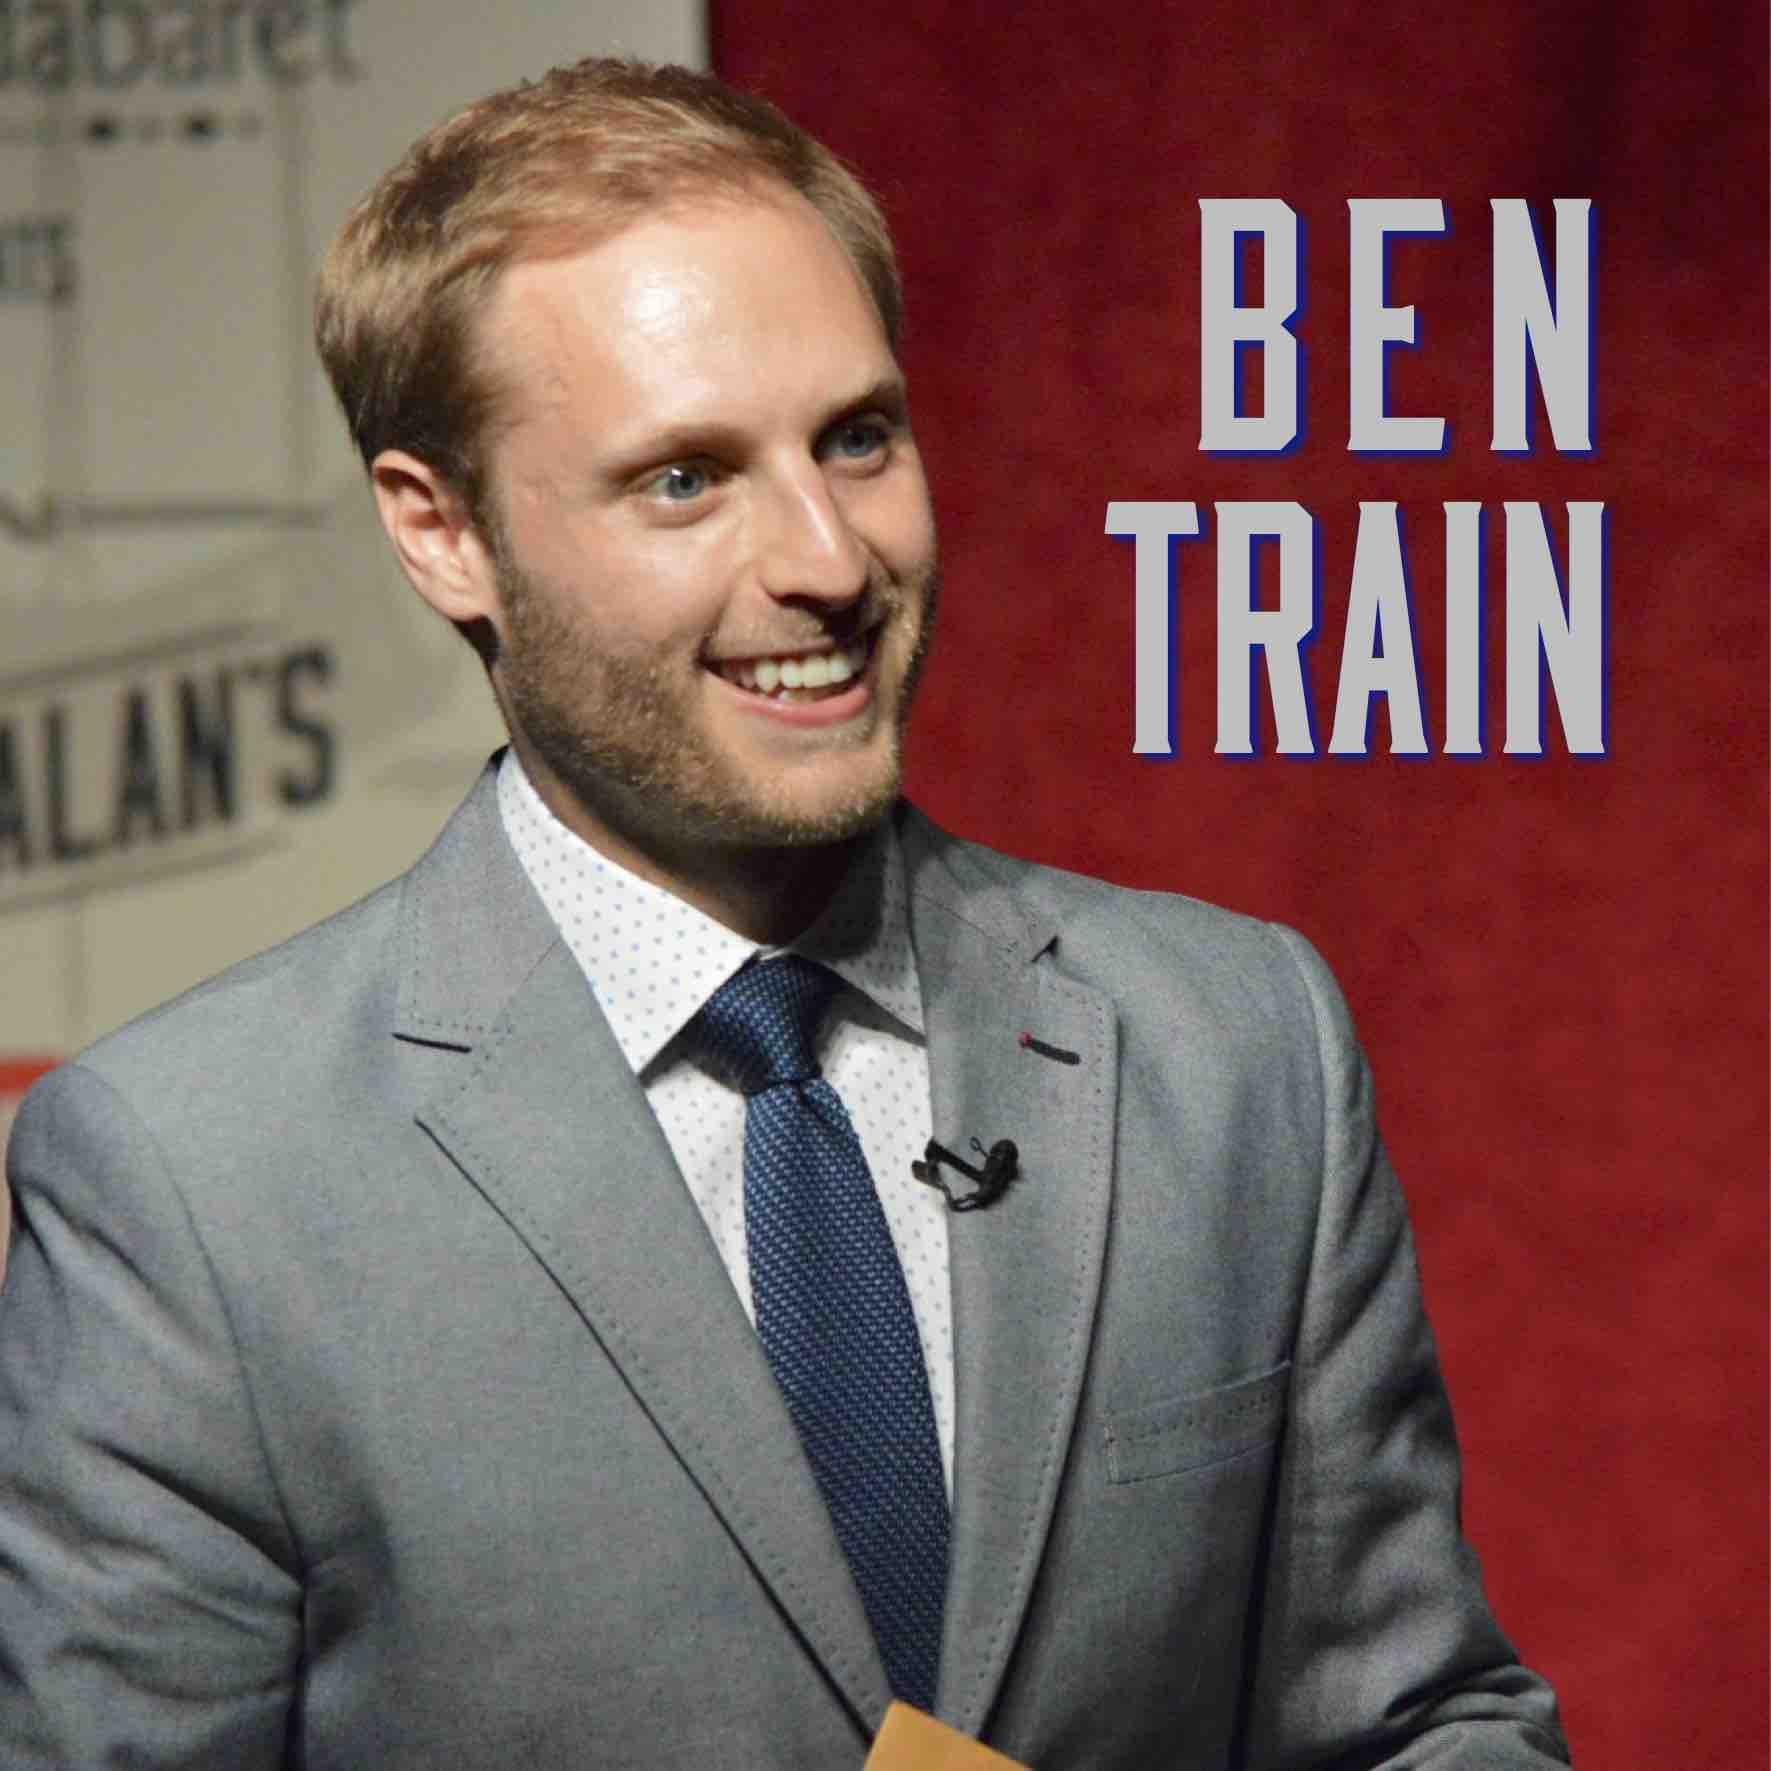 Train-Ben.jpg